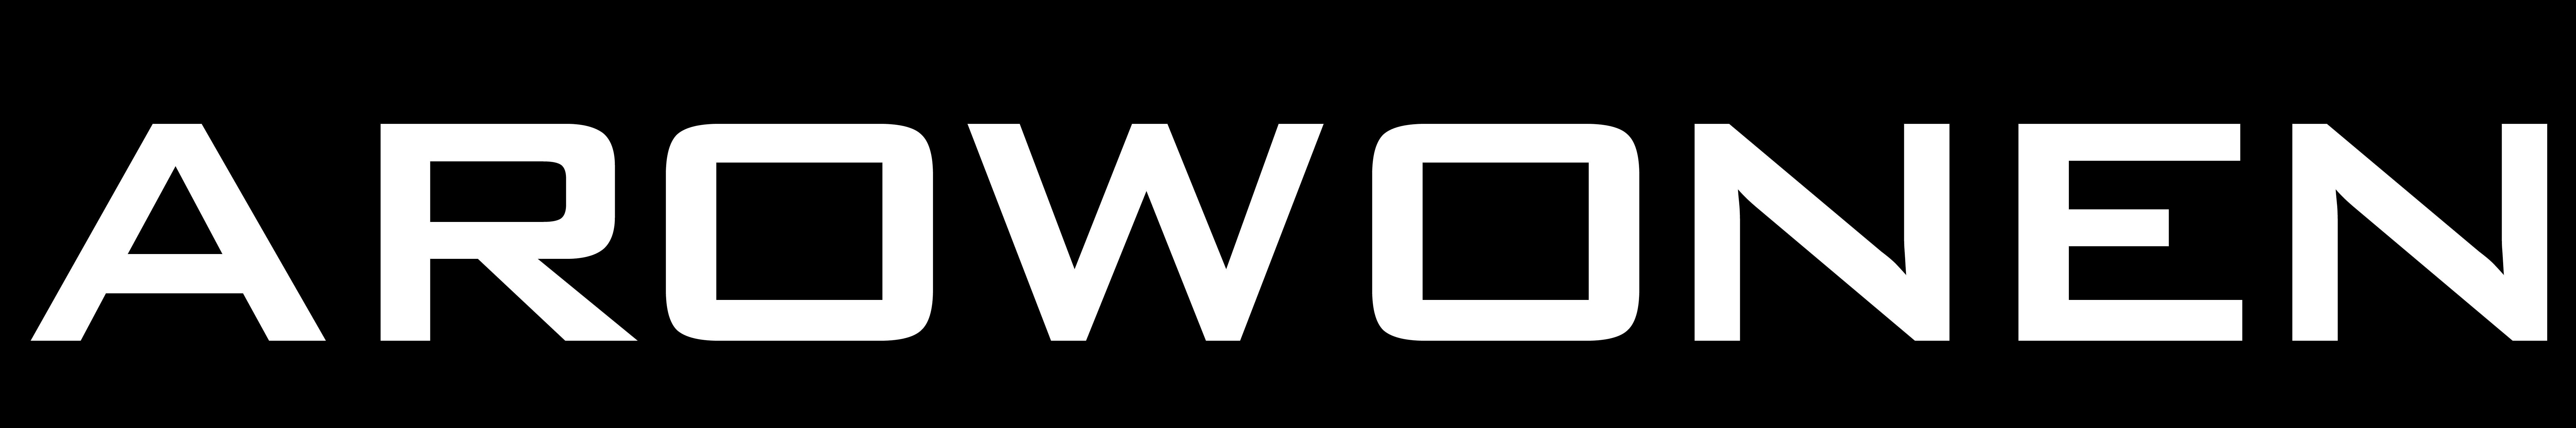 Aro Wonen